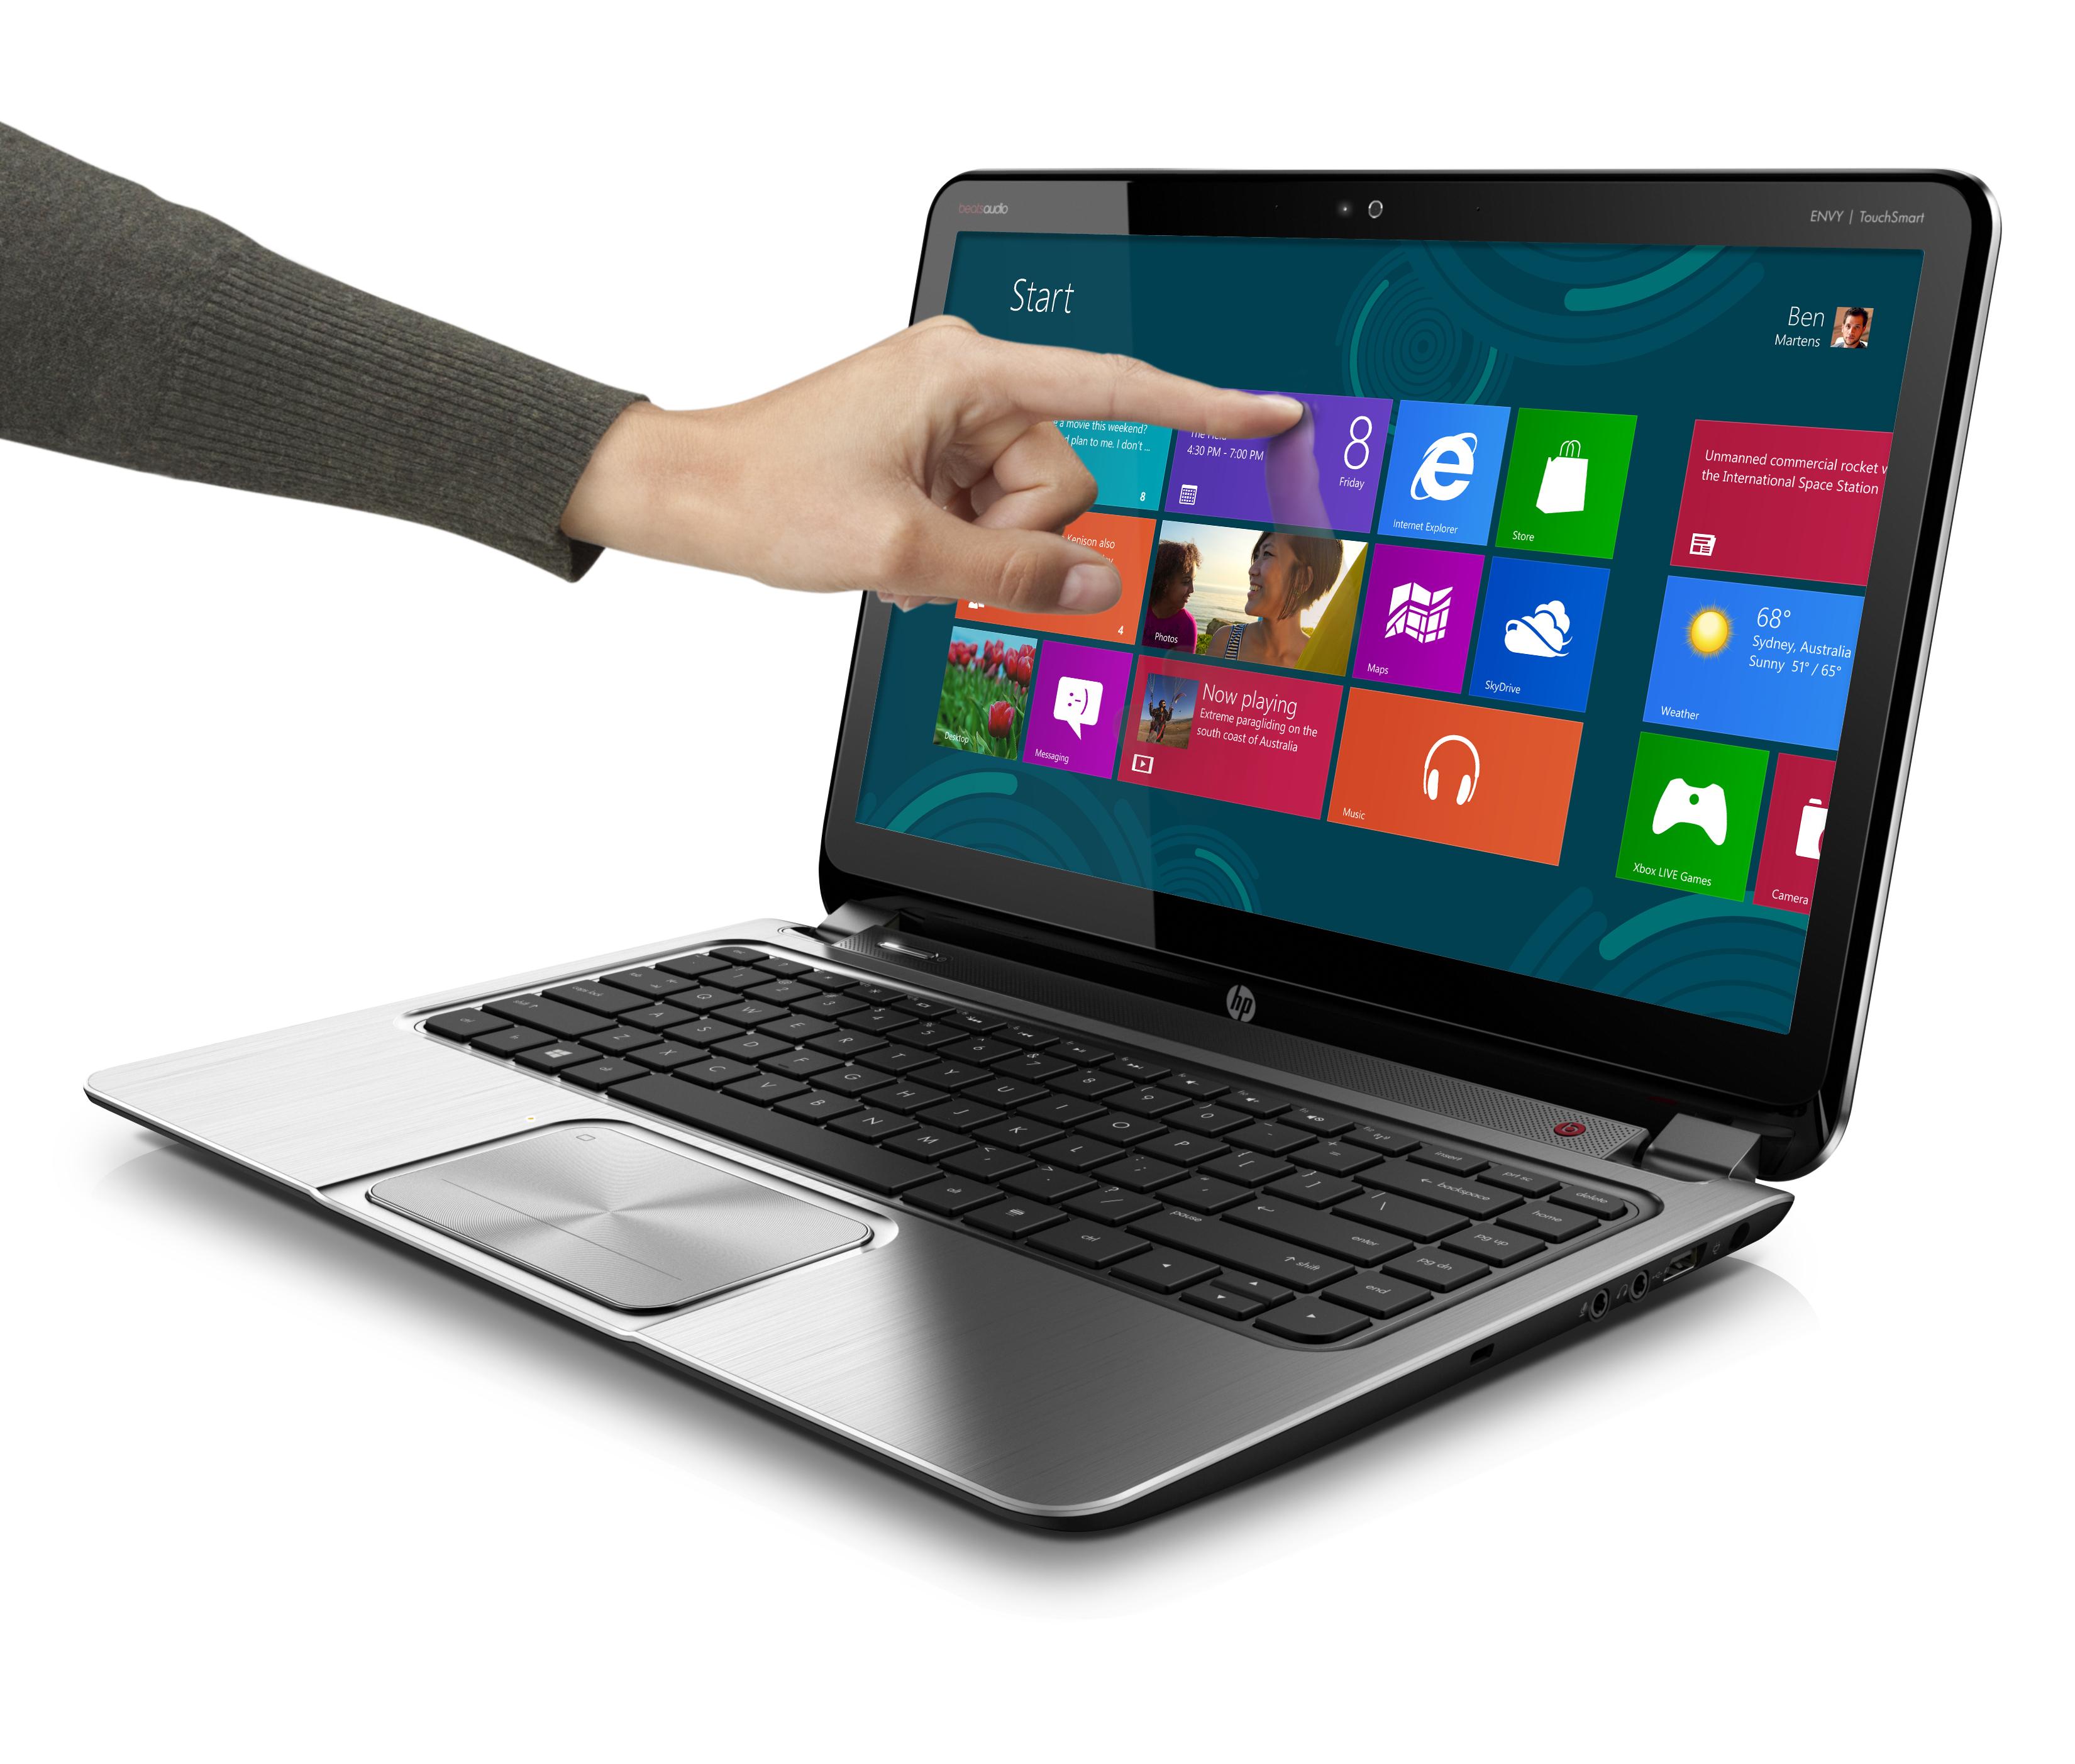 HP ENVY TouchSmart Ultrabook 4_Win8 screen